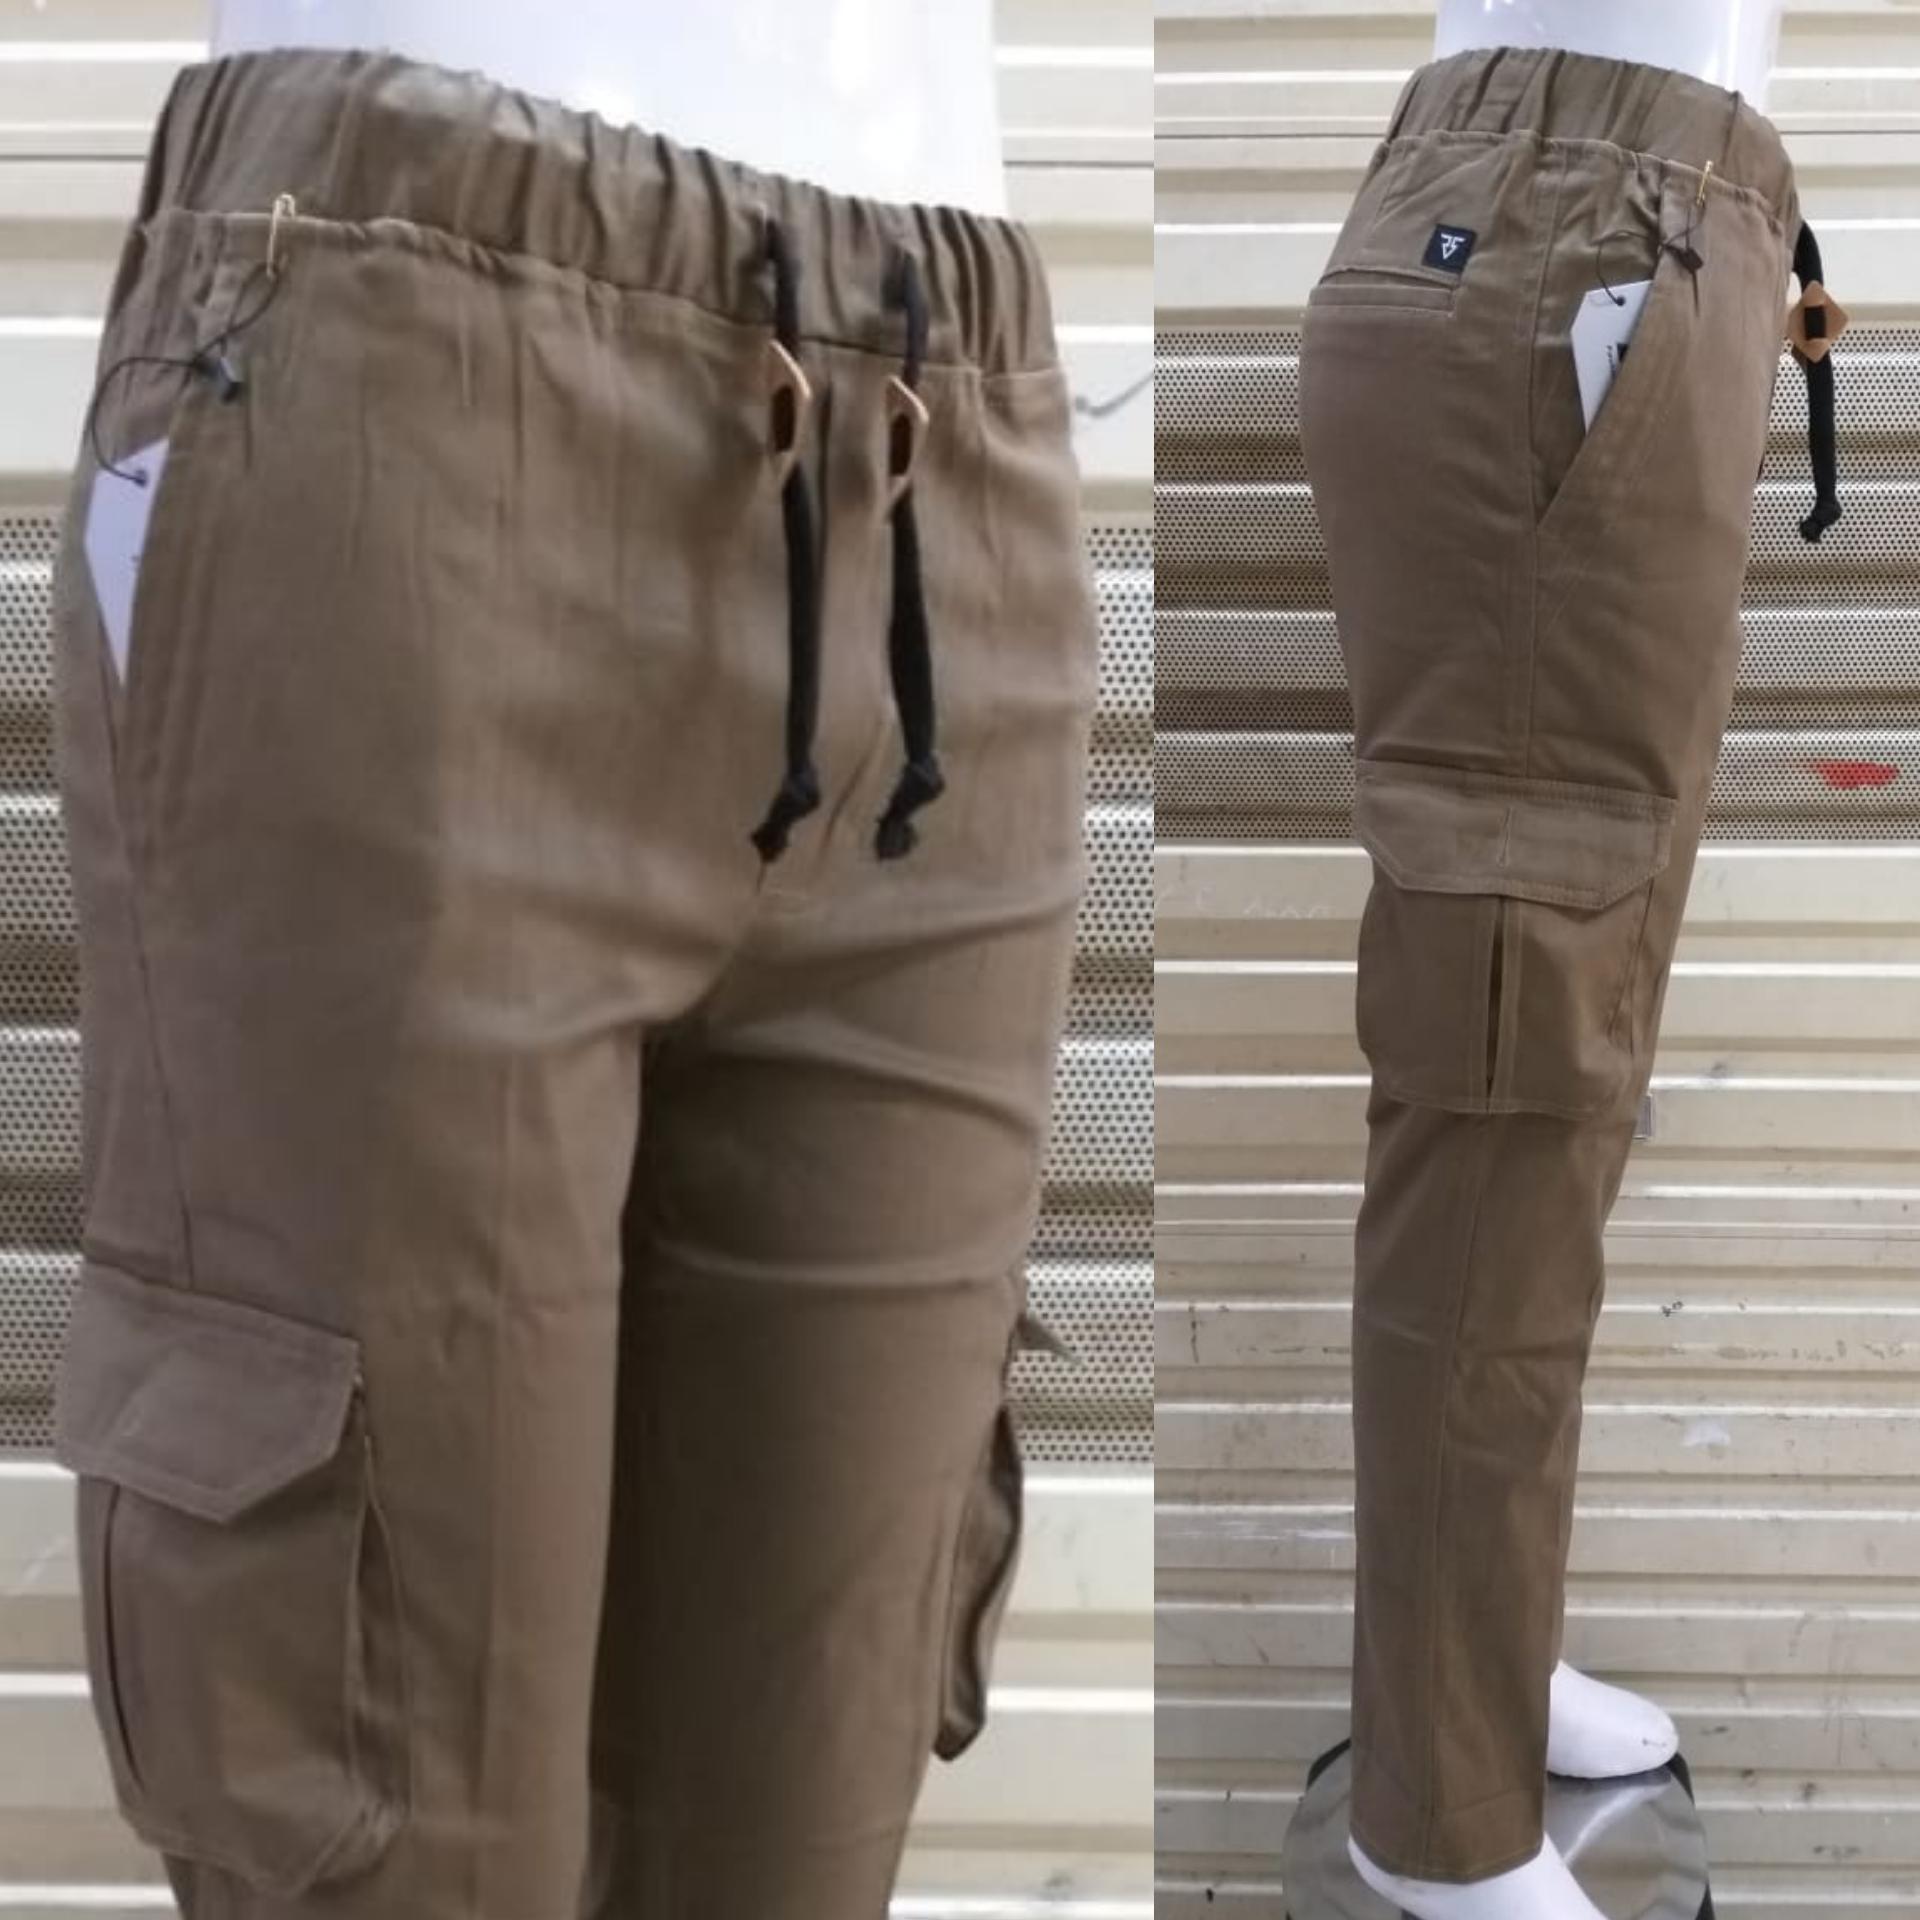 celana panjang cargo wanita bahan cotton strecth/melar kantong samping model slimfit bagus murah